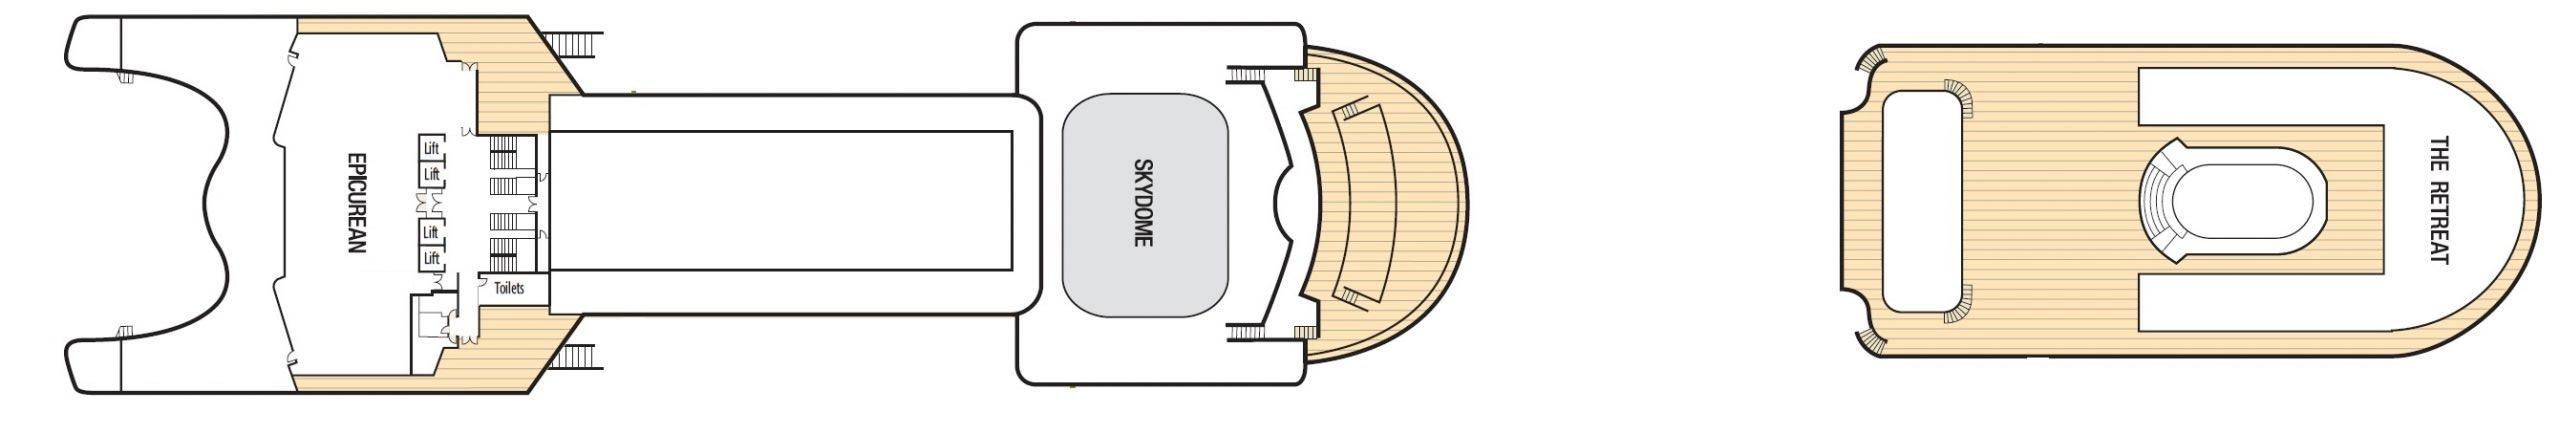 Deck 17 – Sports